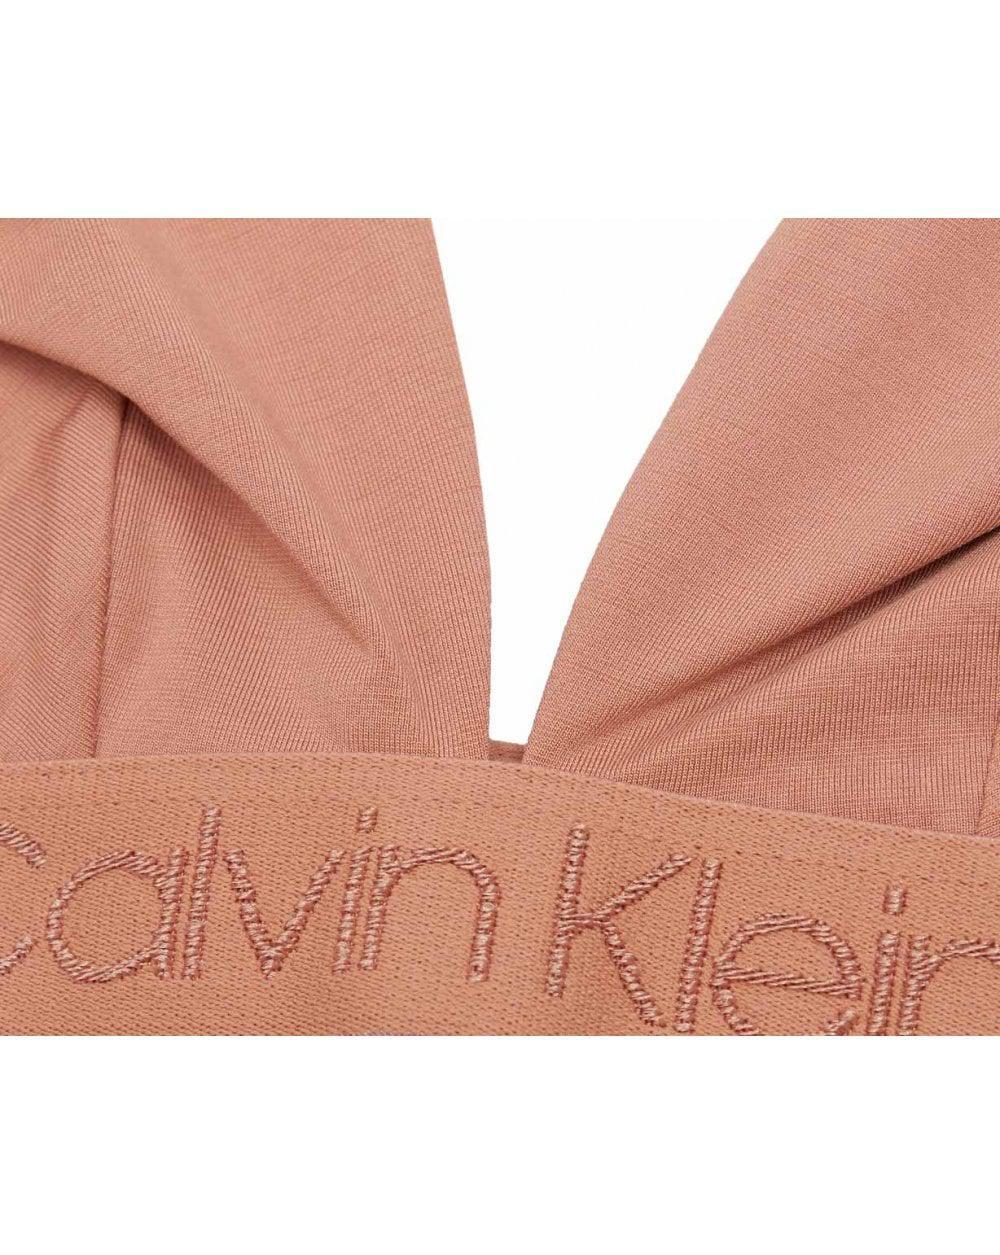 Calvin Klein Unlined Logo Triangle Bralette - Lyst